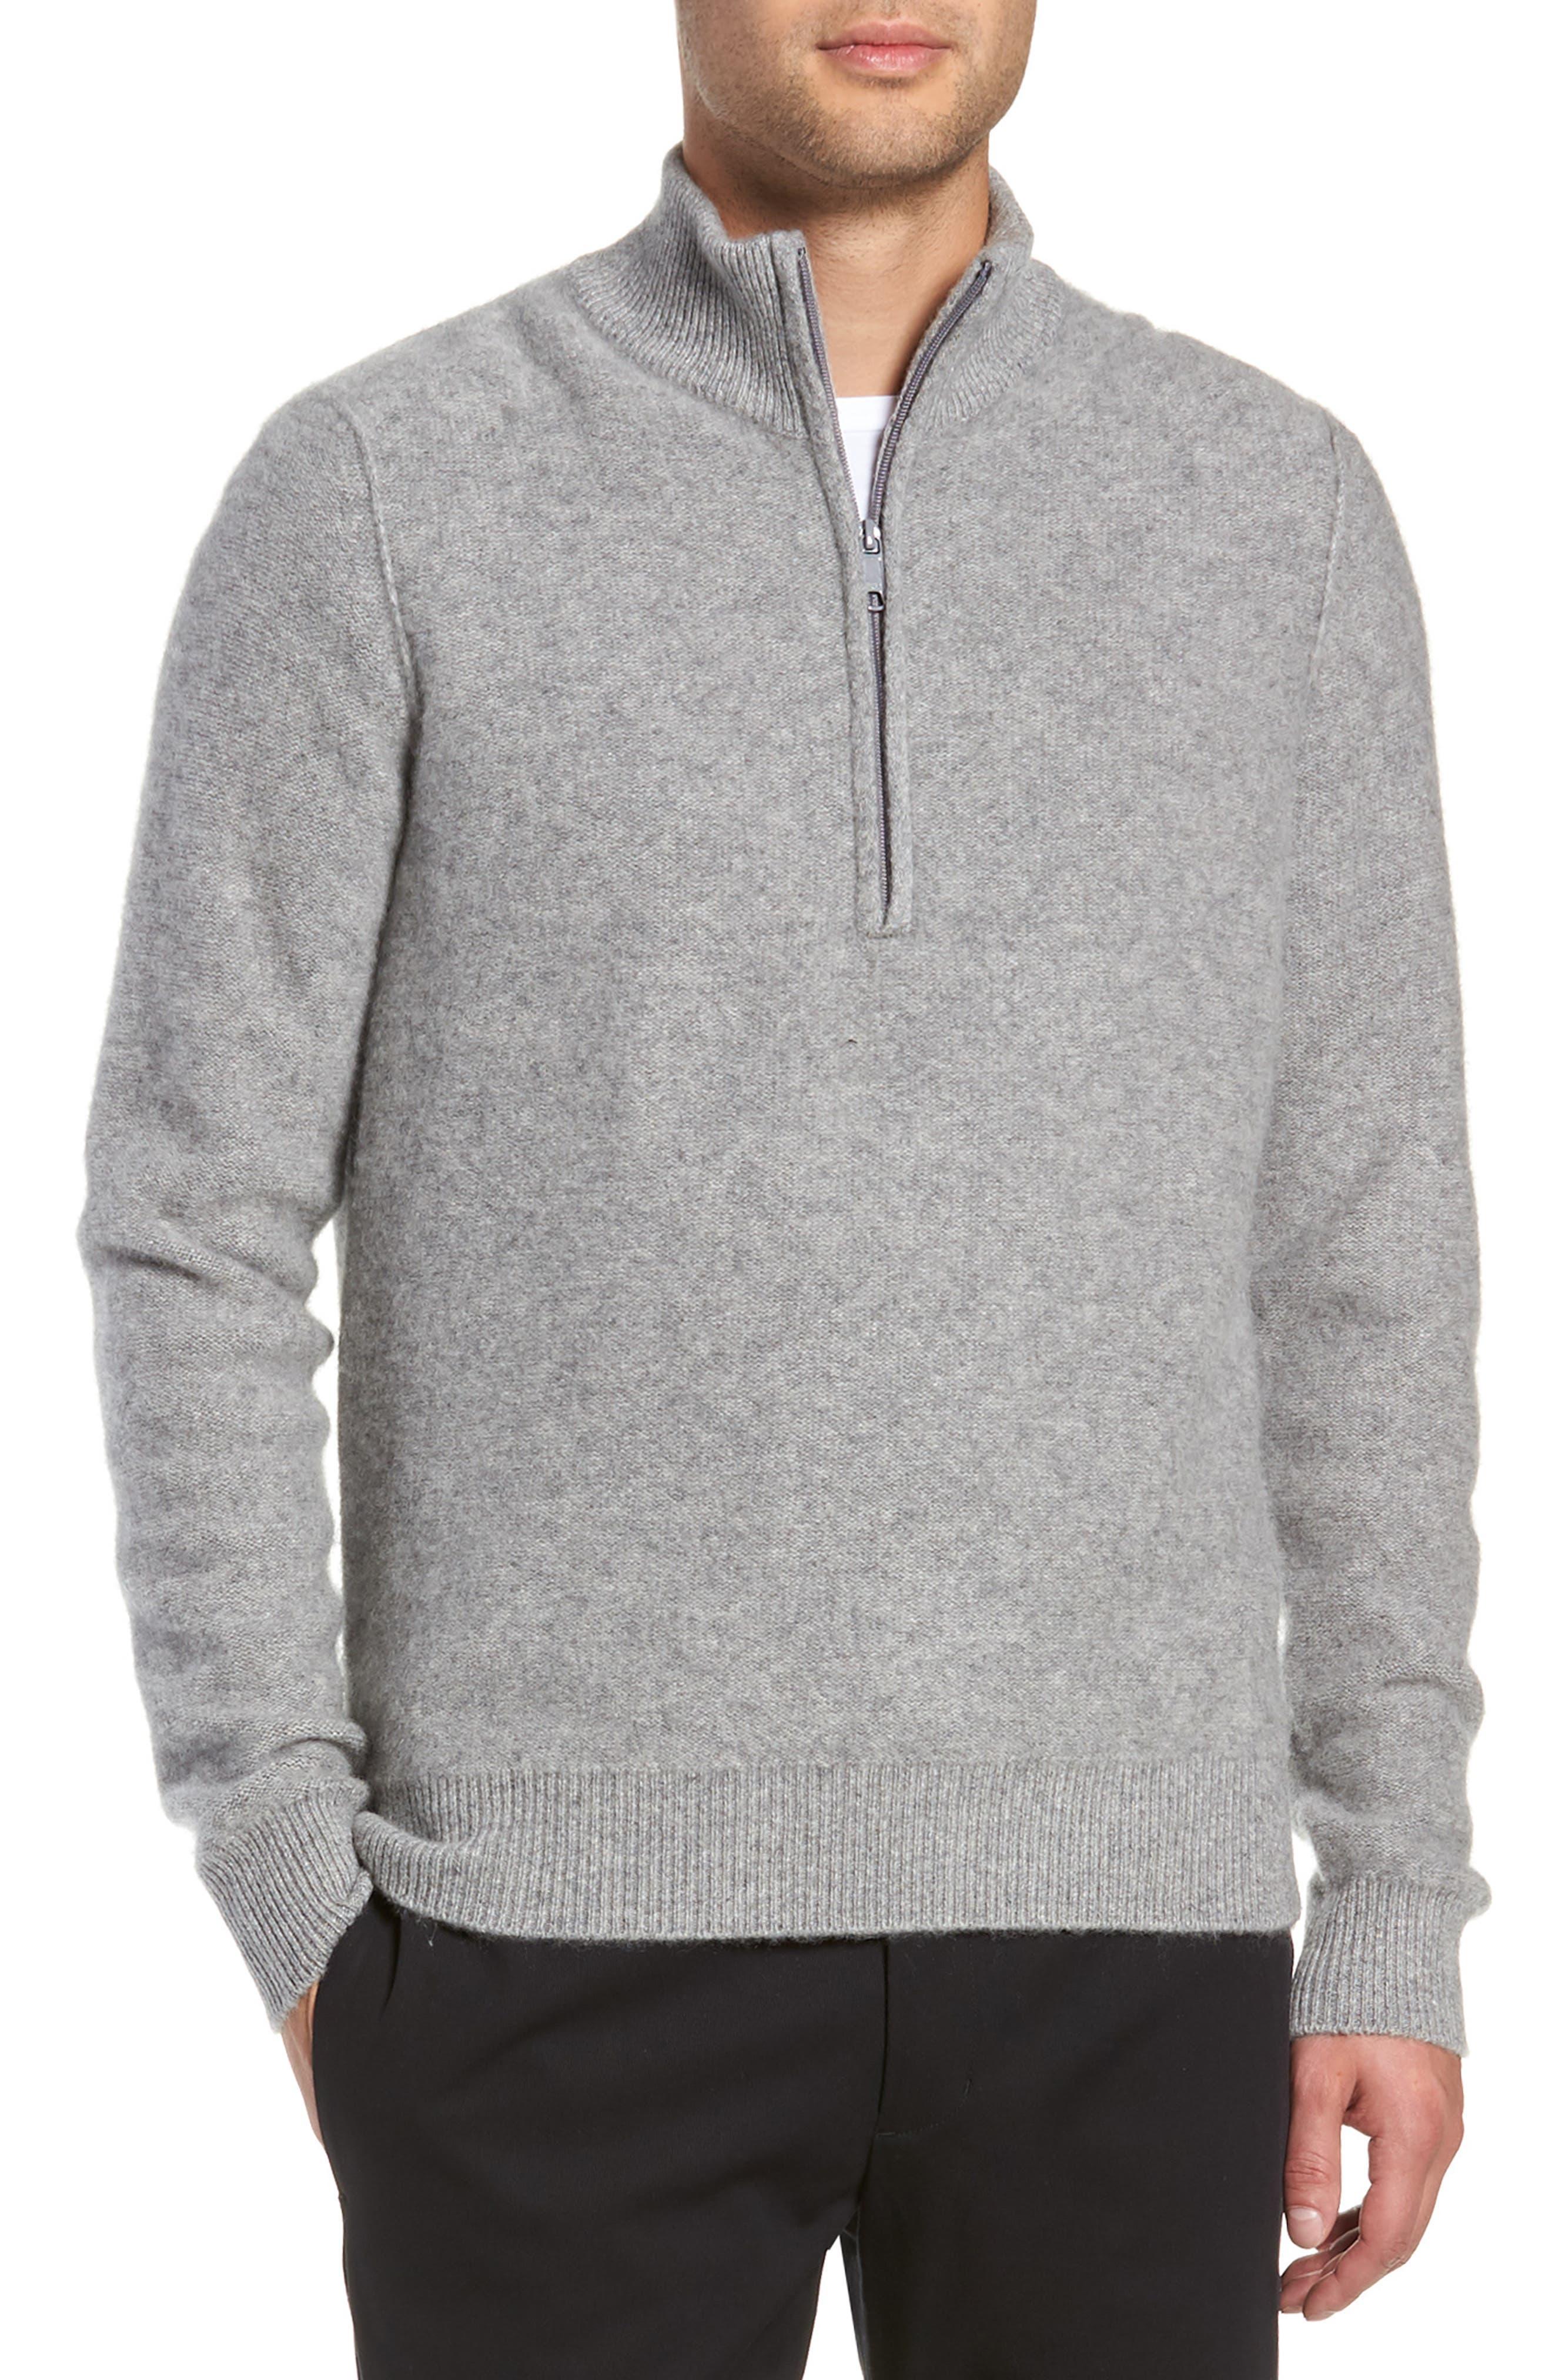 Cashmere Quarter Zip Sweater,                             Main thumbnail 1, color,                             H GREY